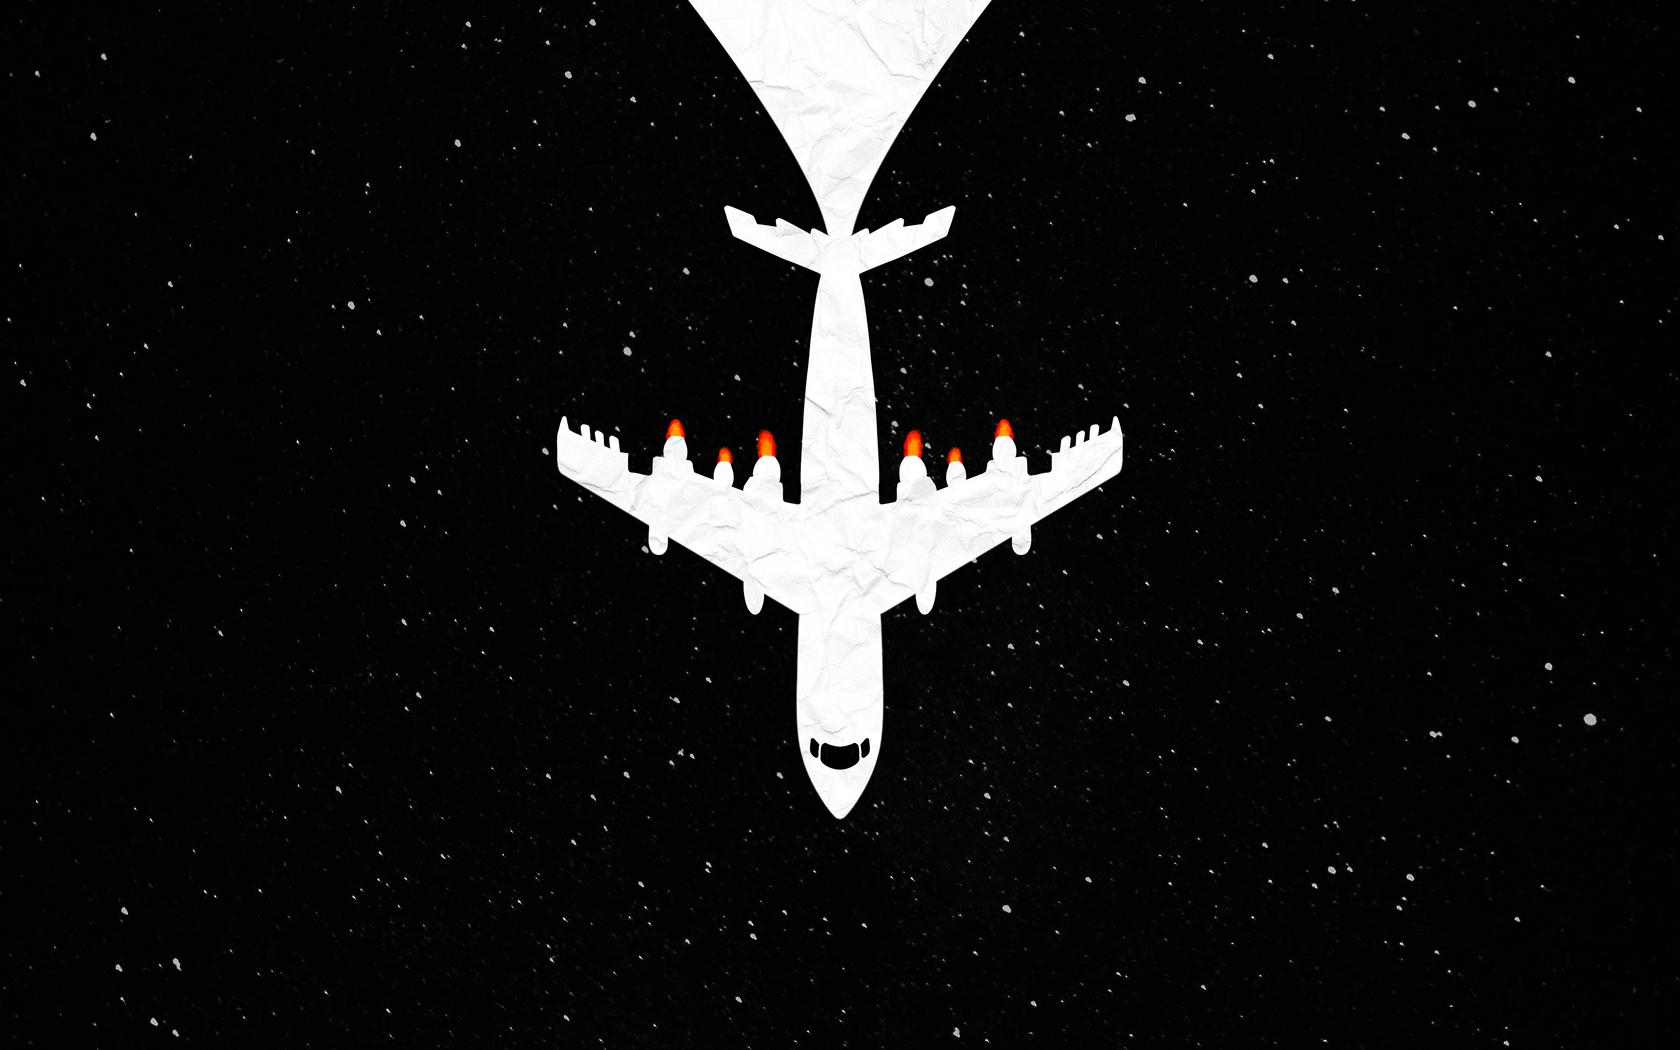 planes-dark-black-minimal-4k-fk.jpg